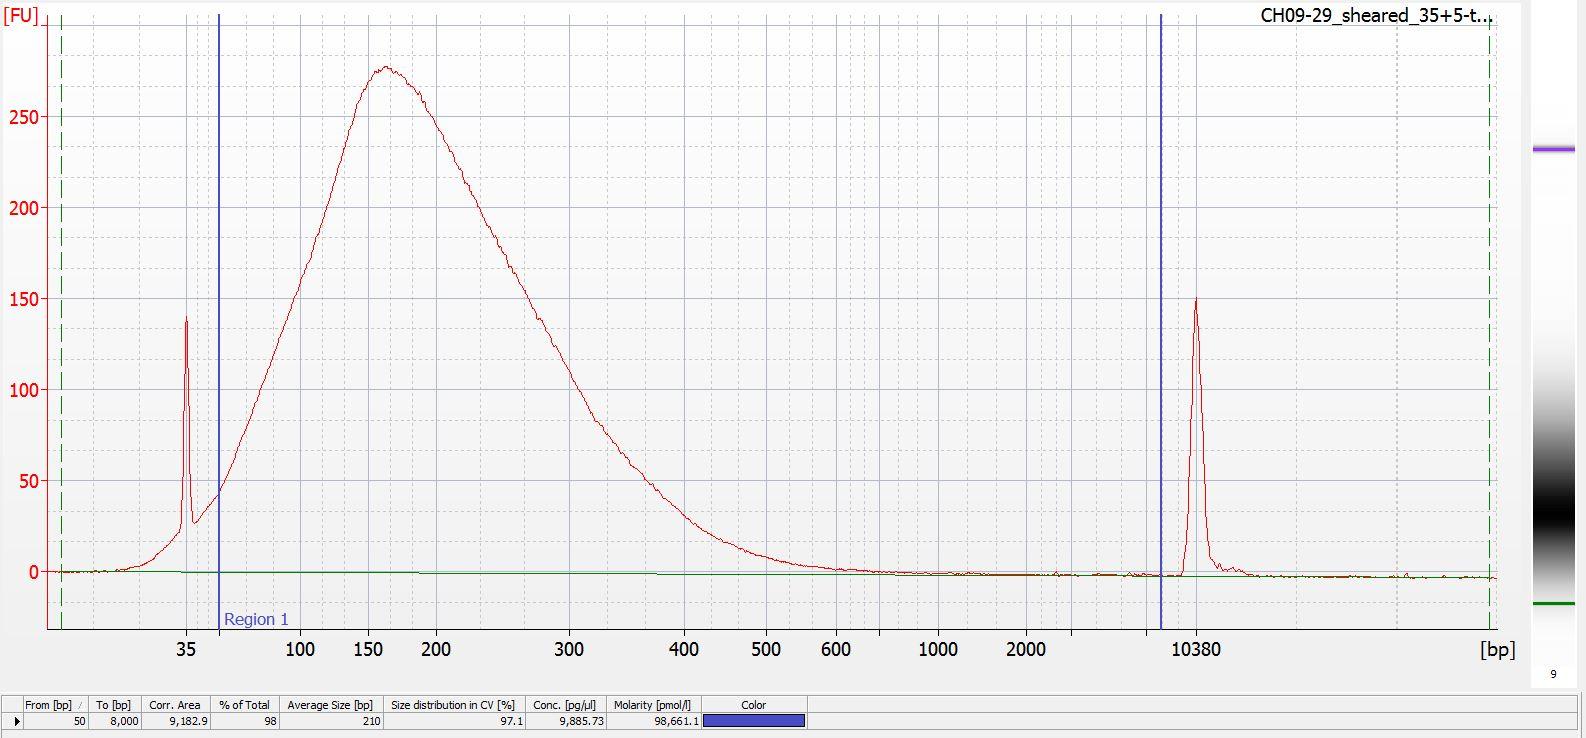 Sheared CH09-29 Bioanalyzer electropherogram